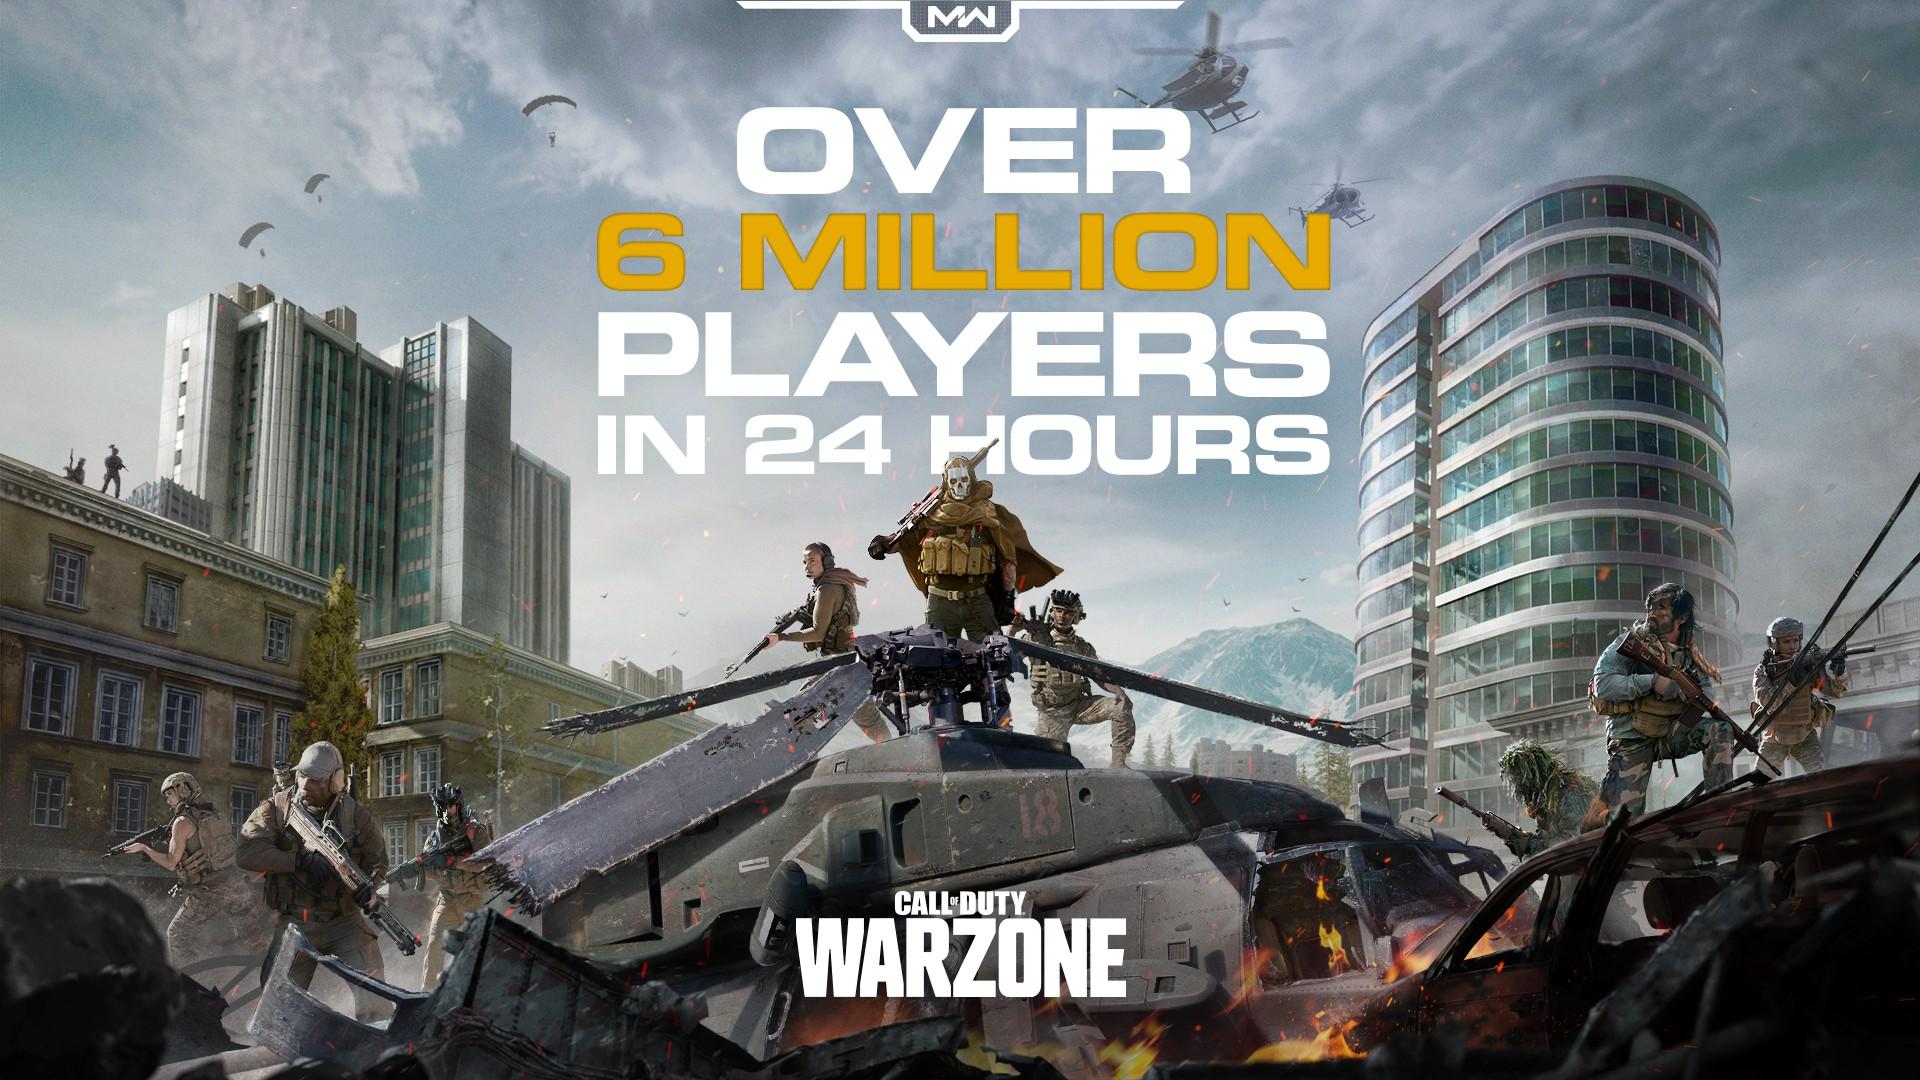 COD16吃雞模式《使命召喚:戰區》表現搶眼 玩家人數超600萬